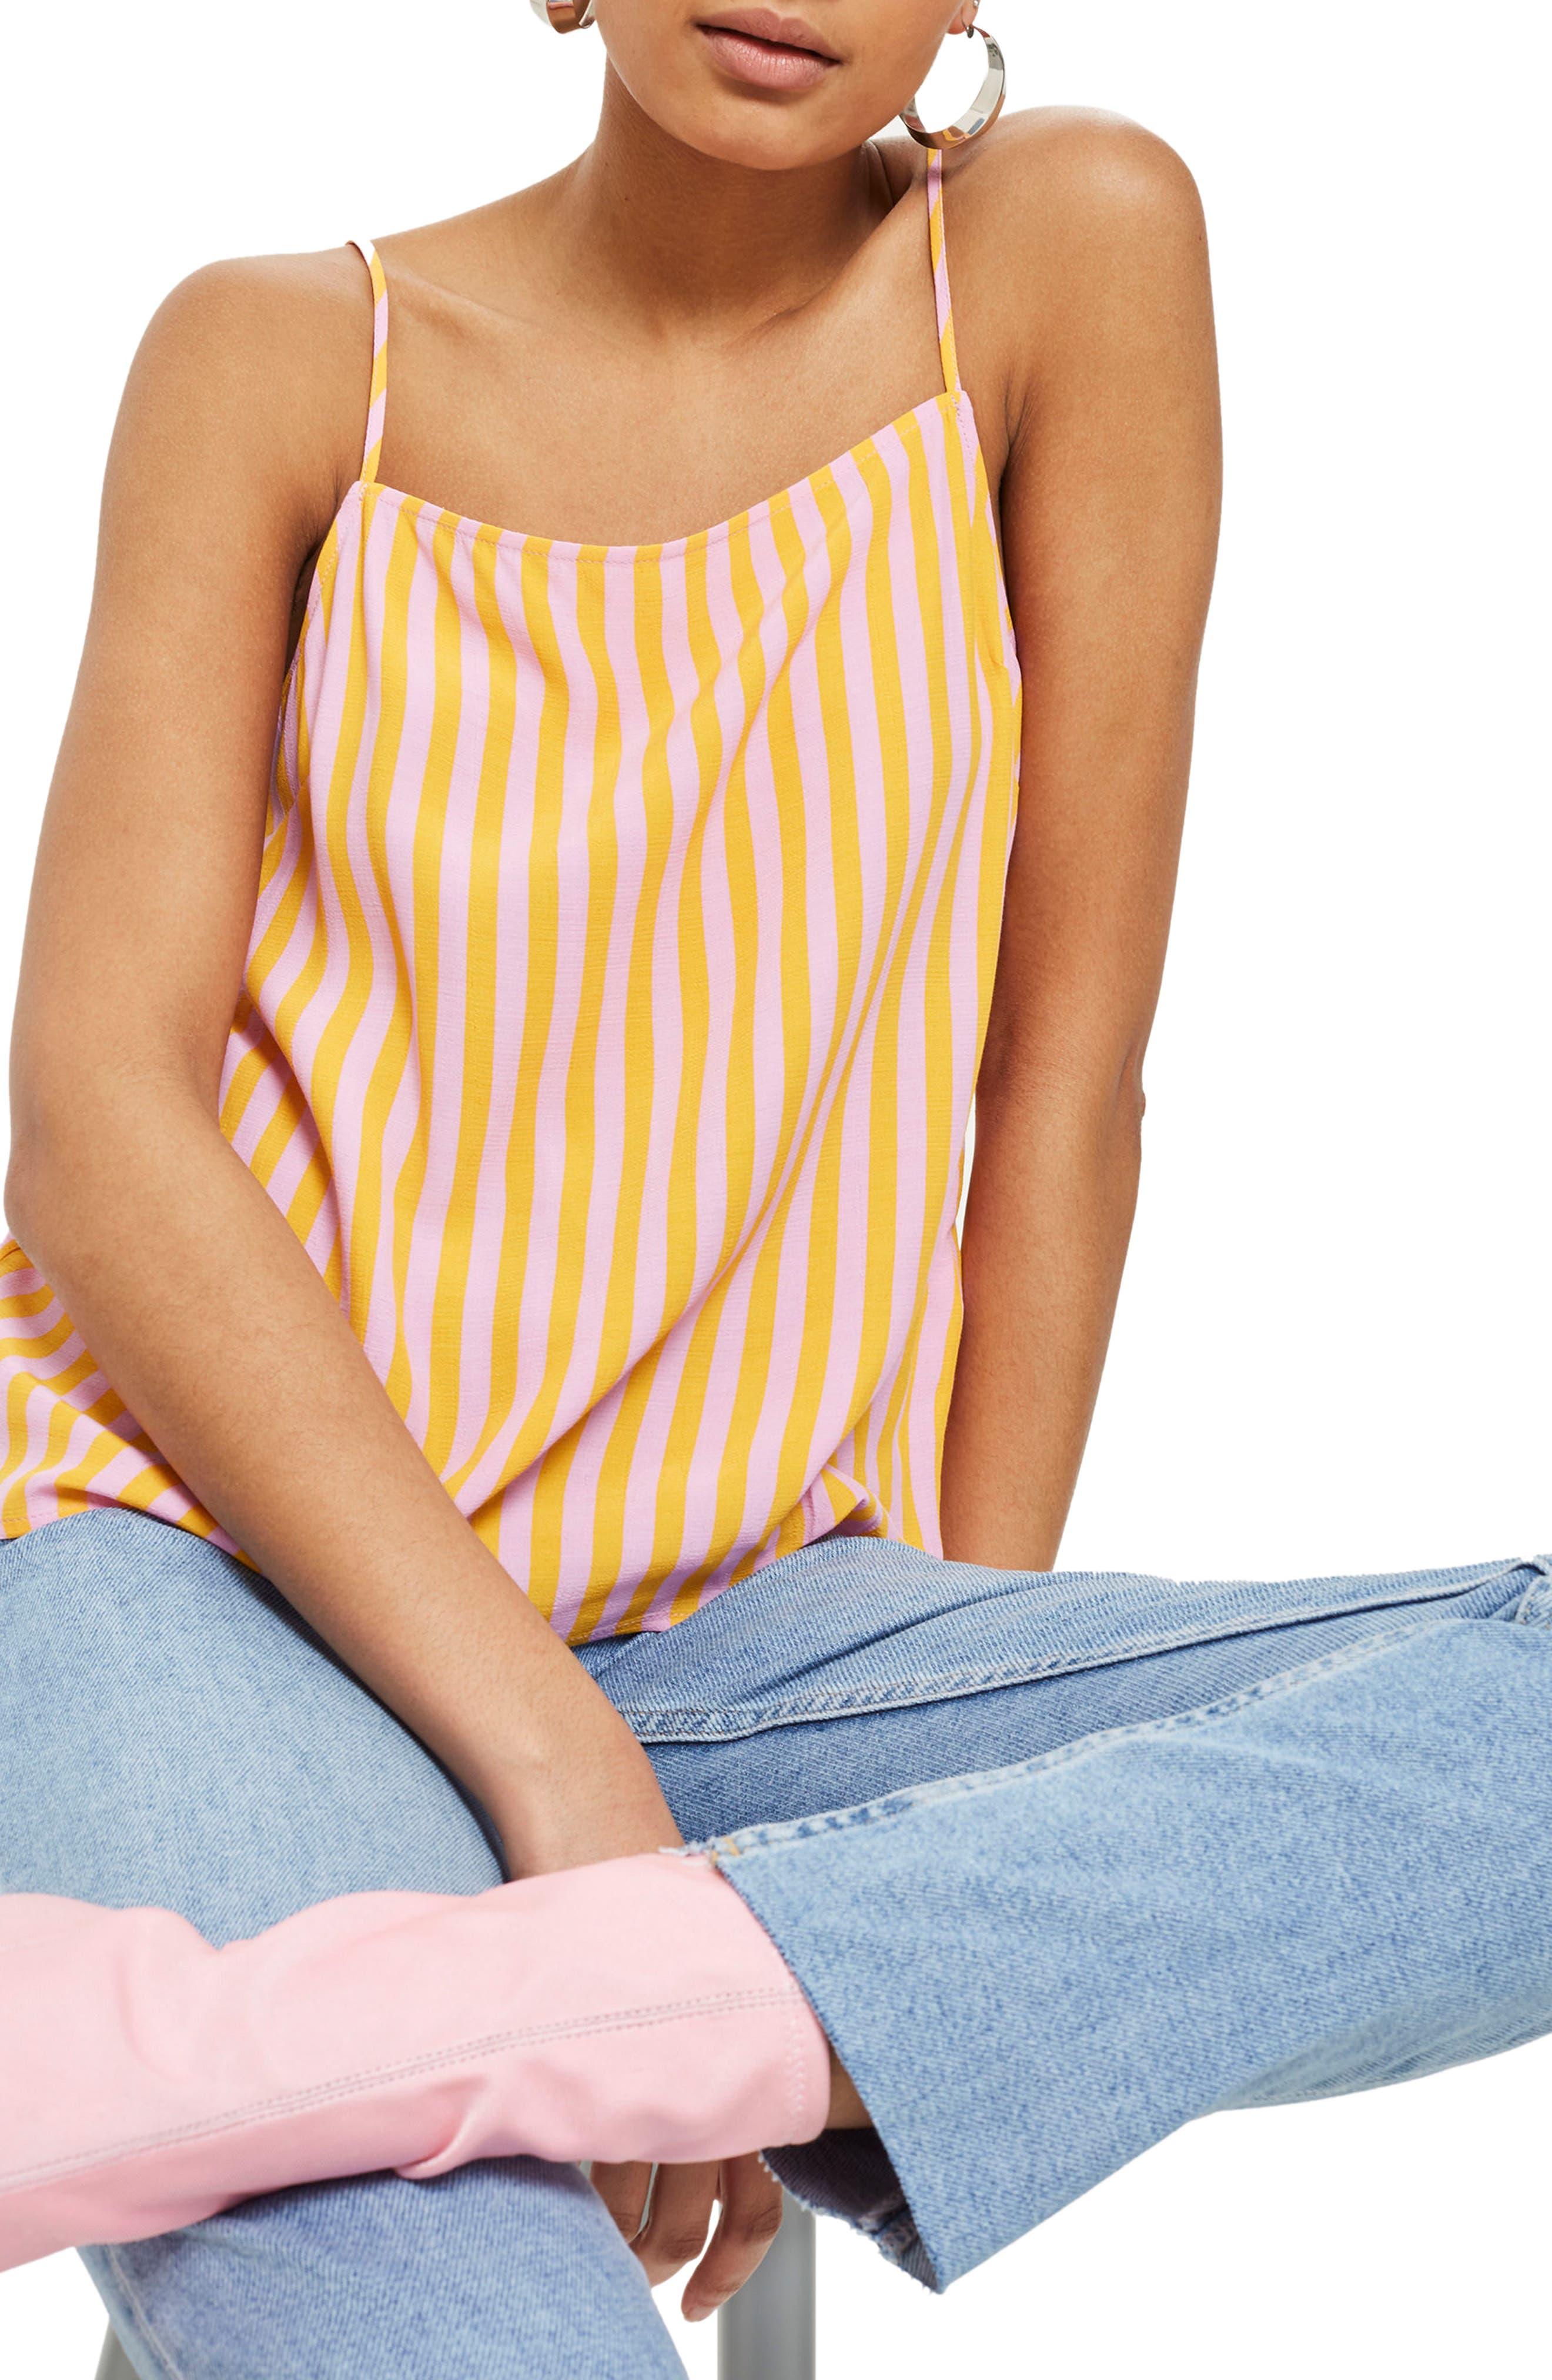 Fruit Salad Stripe Camisole Top,                             Main thumbnail 1, color,                             Pink